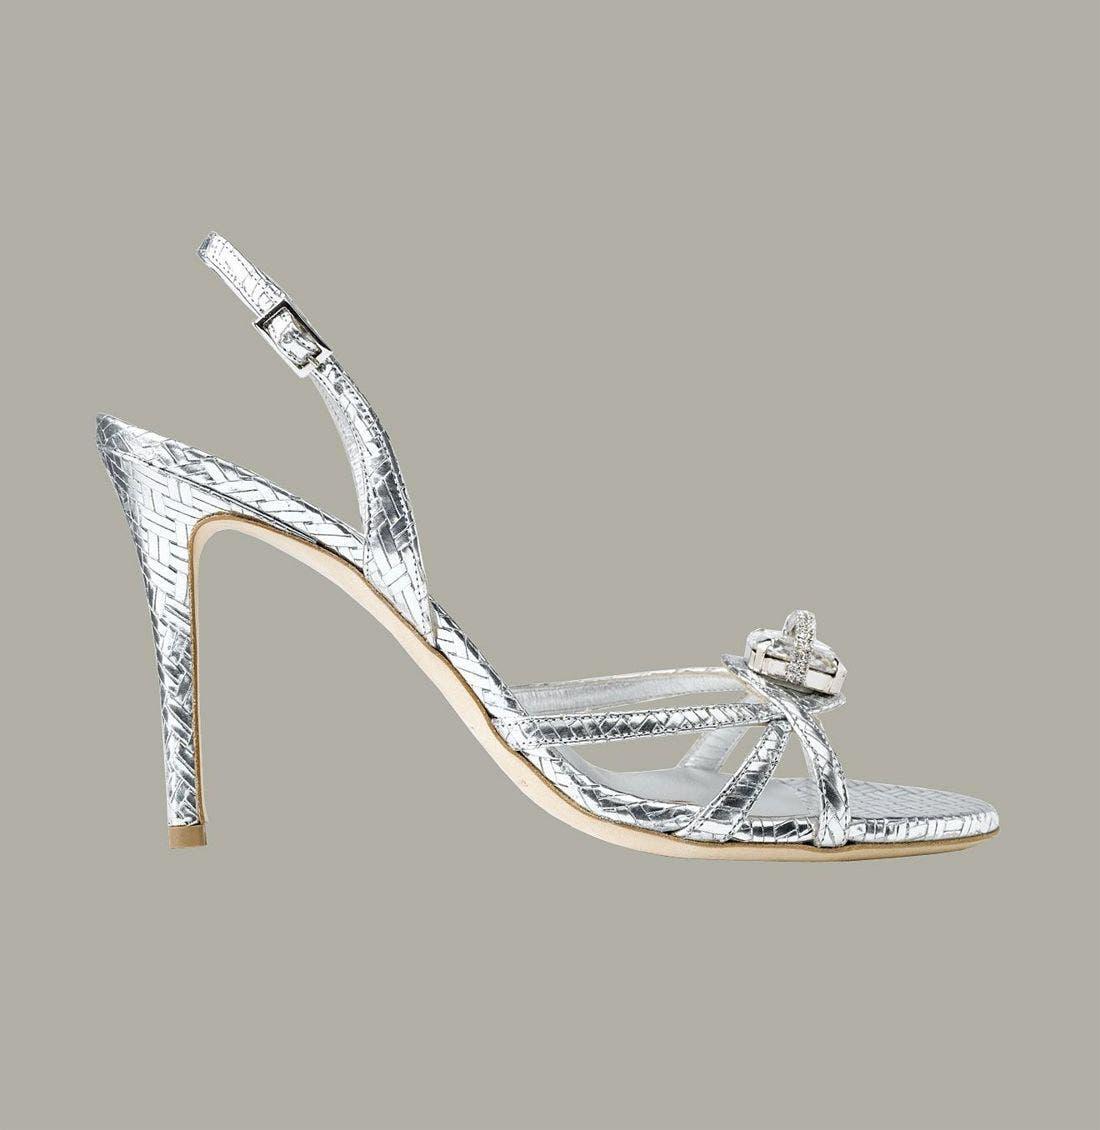 MARY NORTON,                             Metallic Leather Sandal with Swarovski Crystal,                             Alternate thumbnail 2, color,                             040